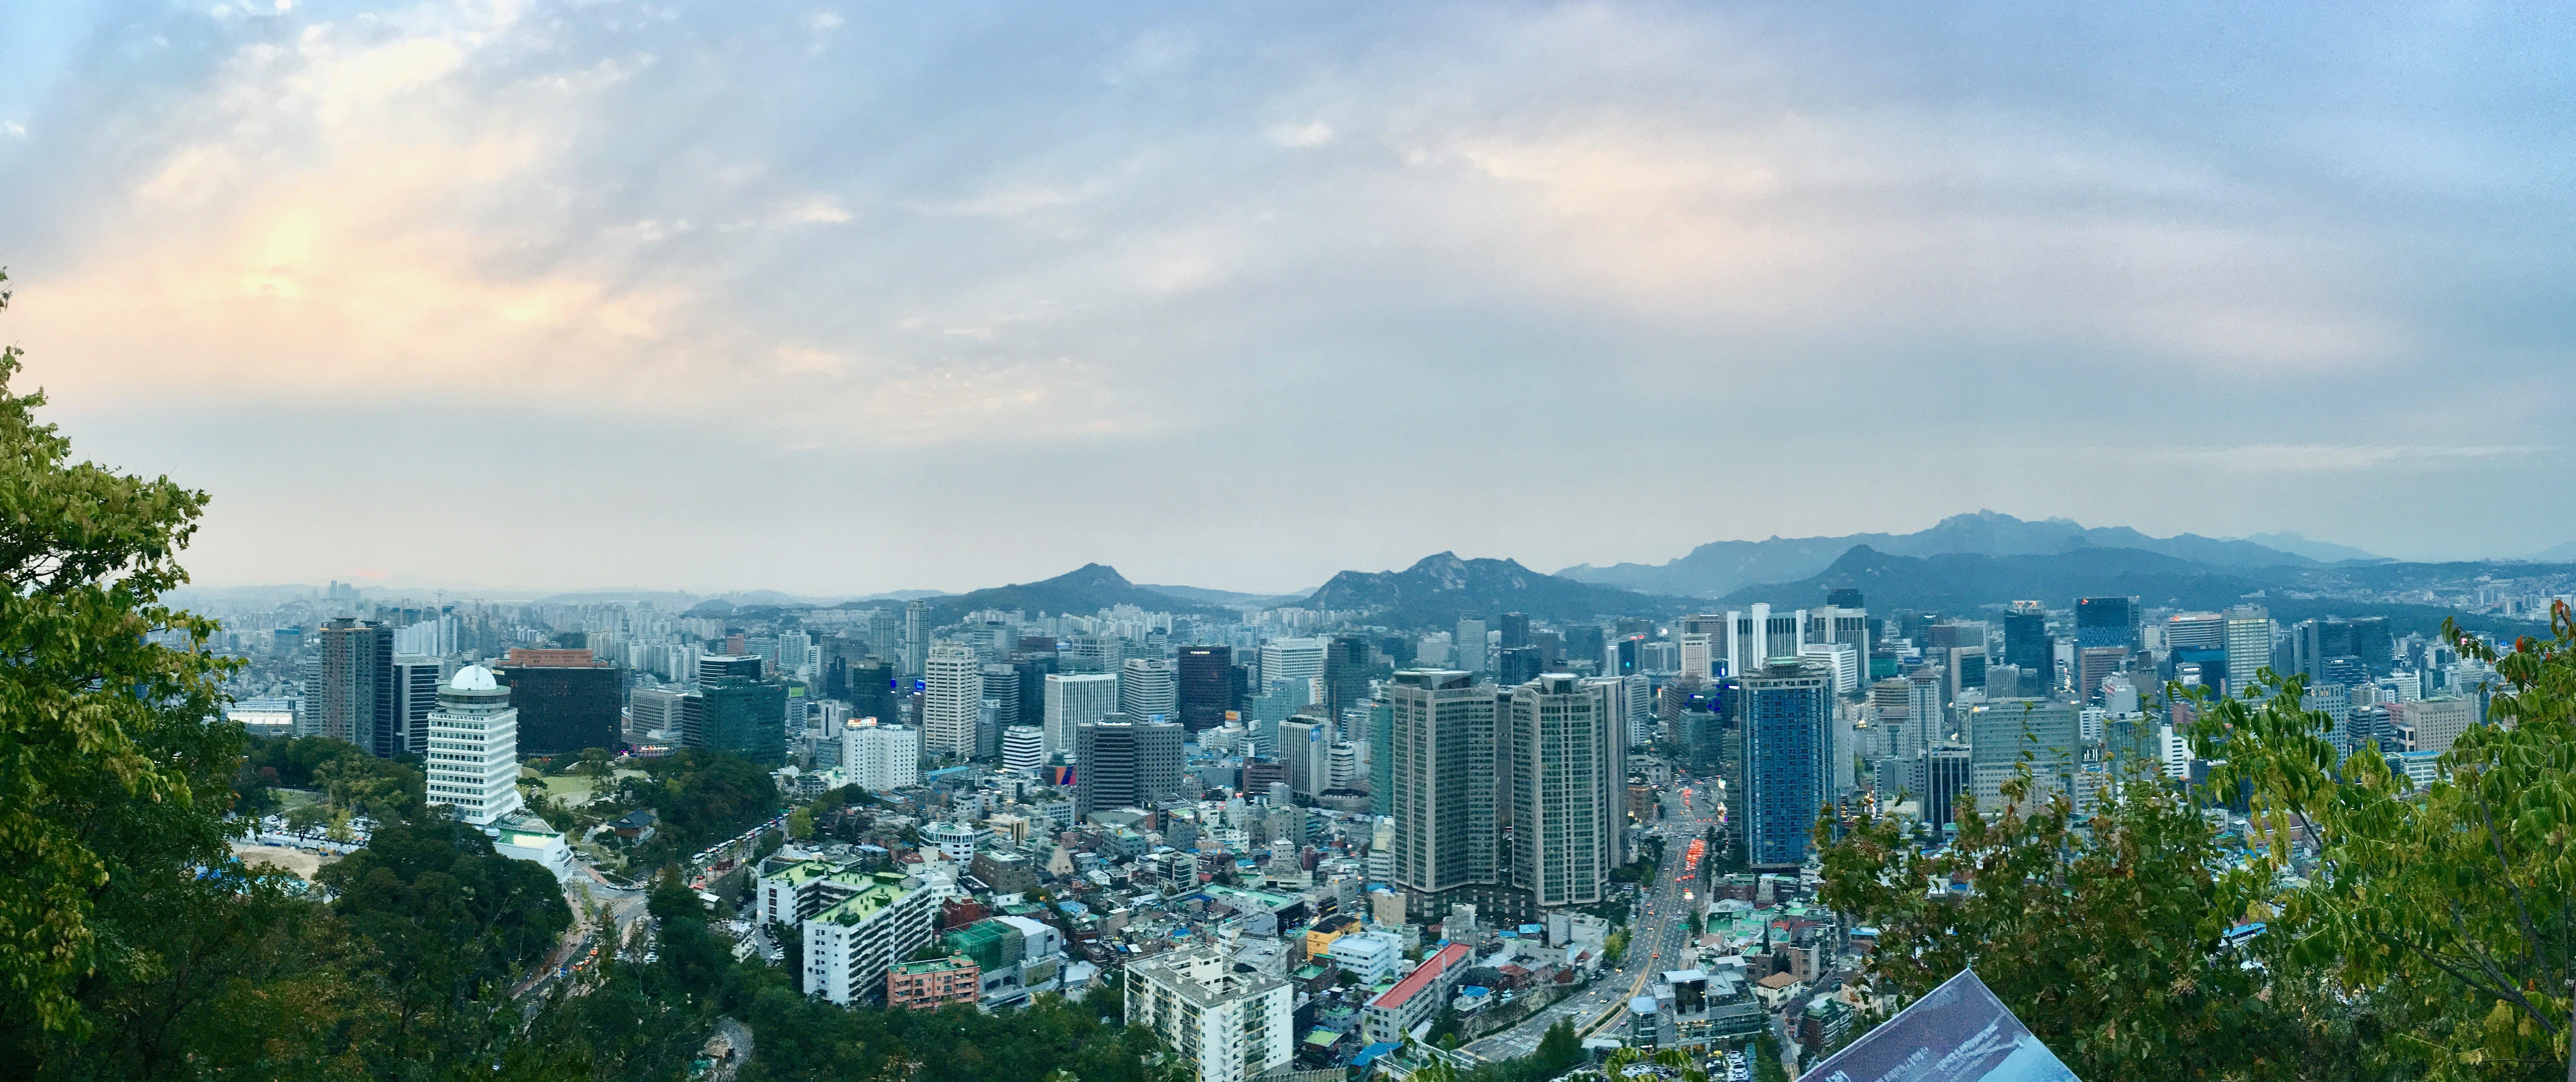 Seoul from Namsan Park